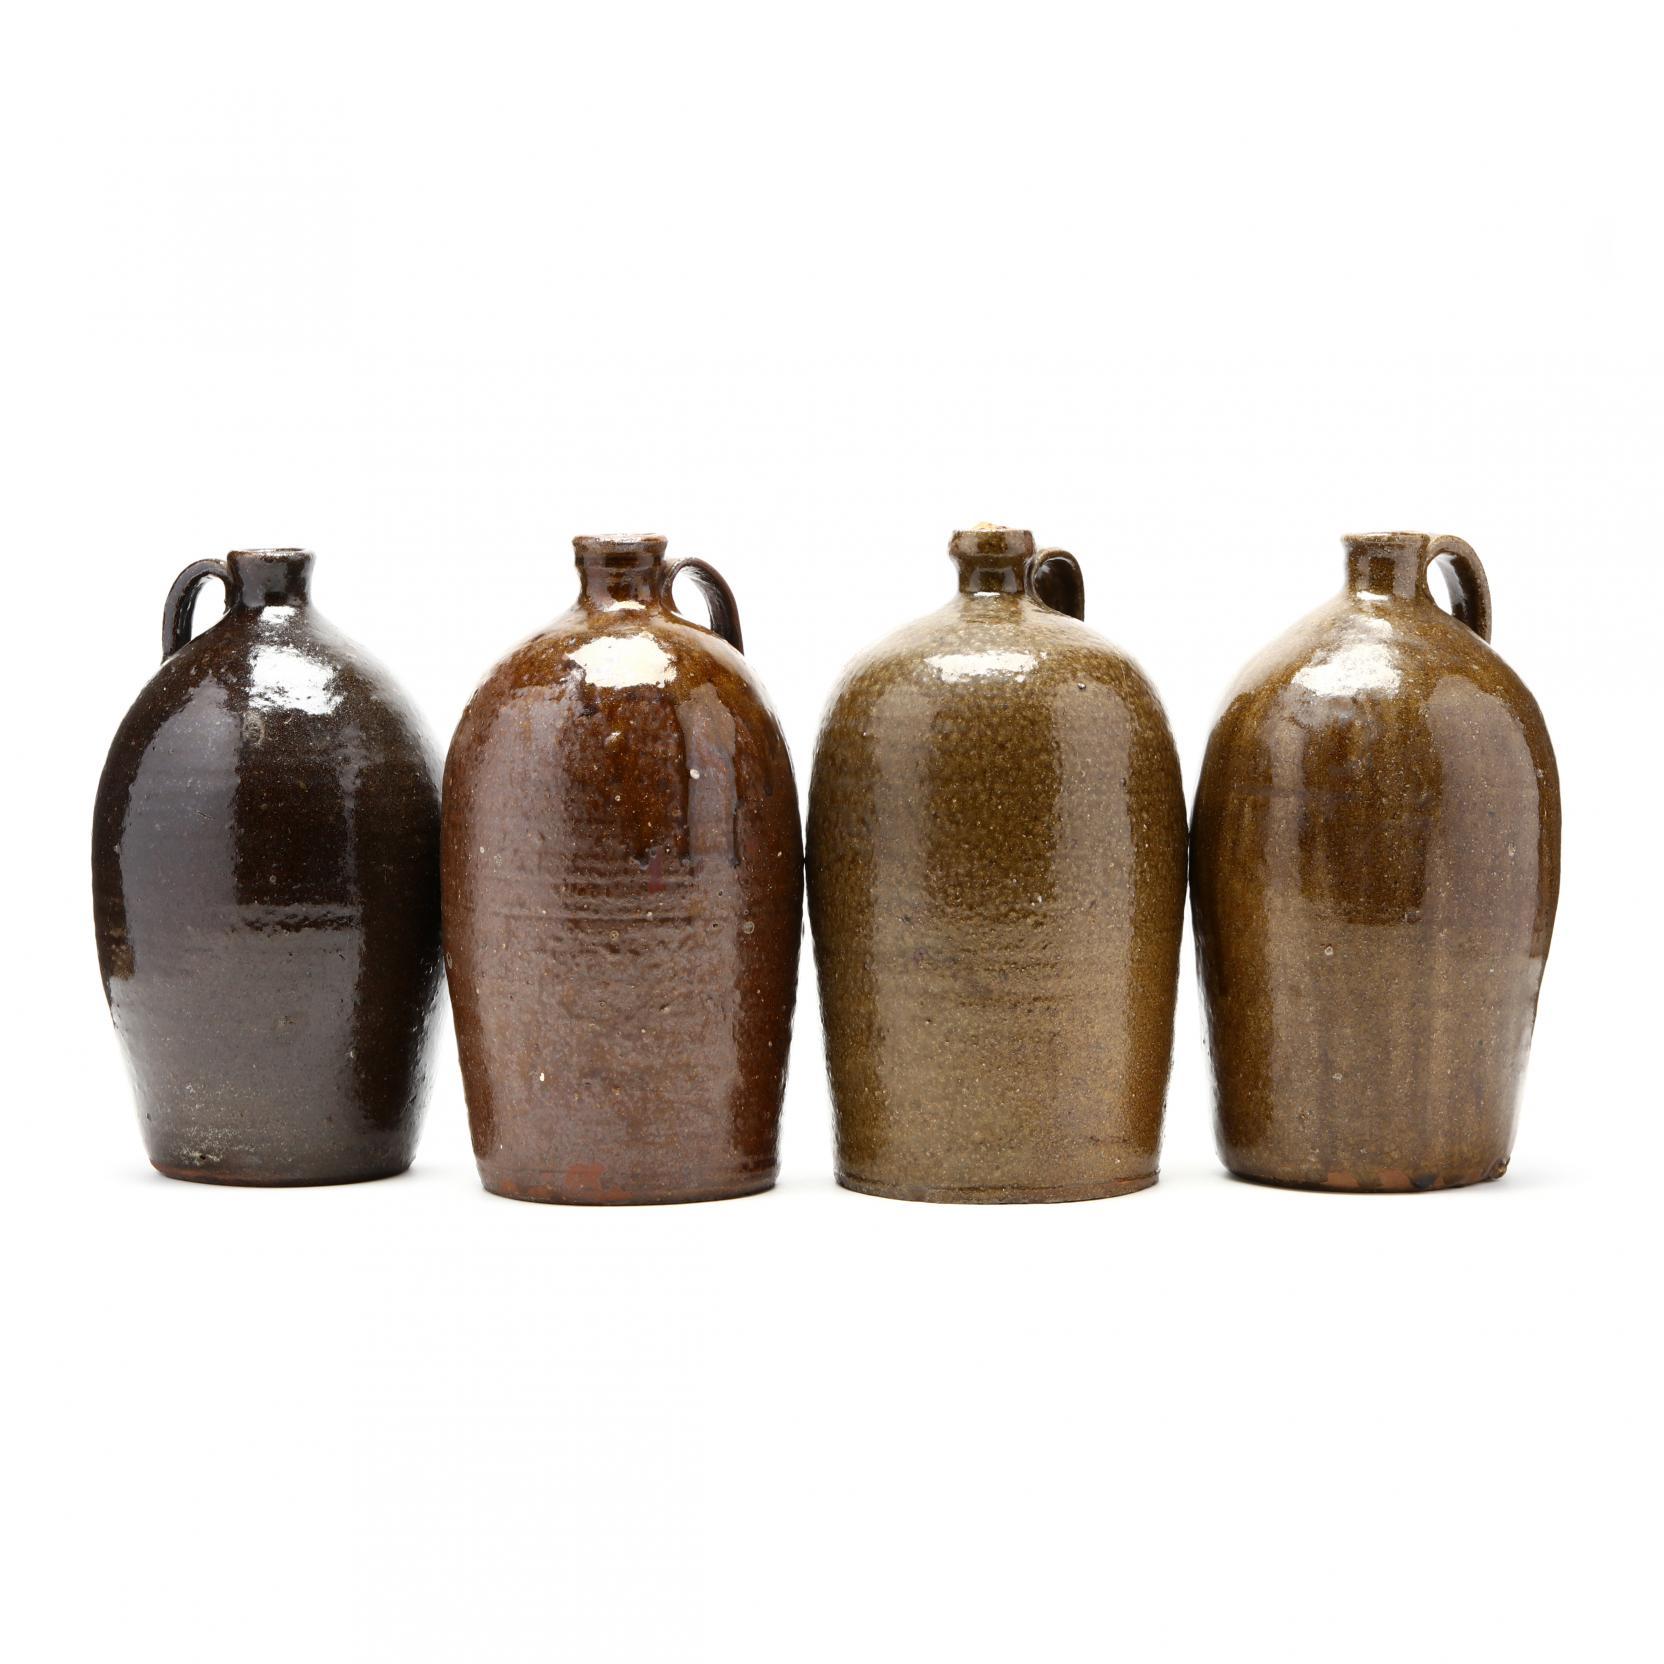 four-western-nc-one-gallon-jugs